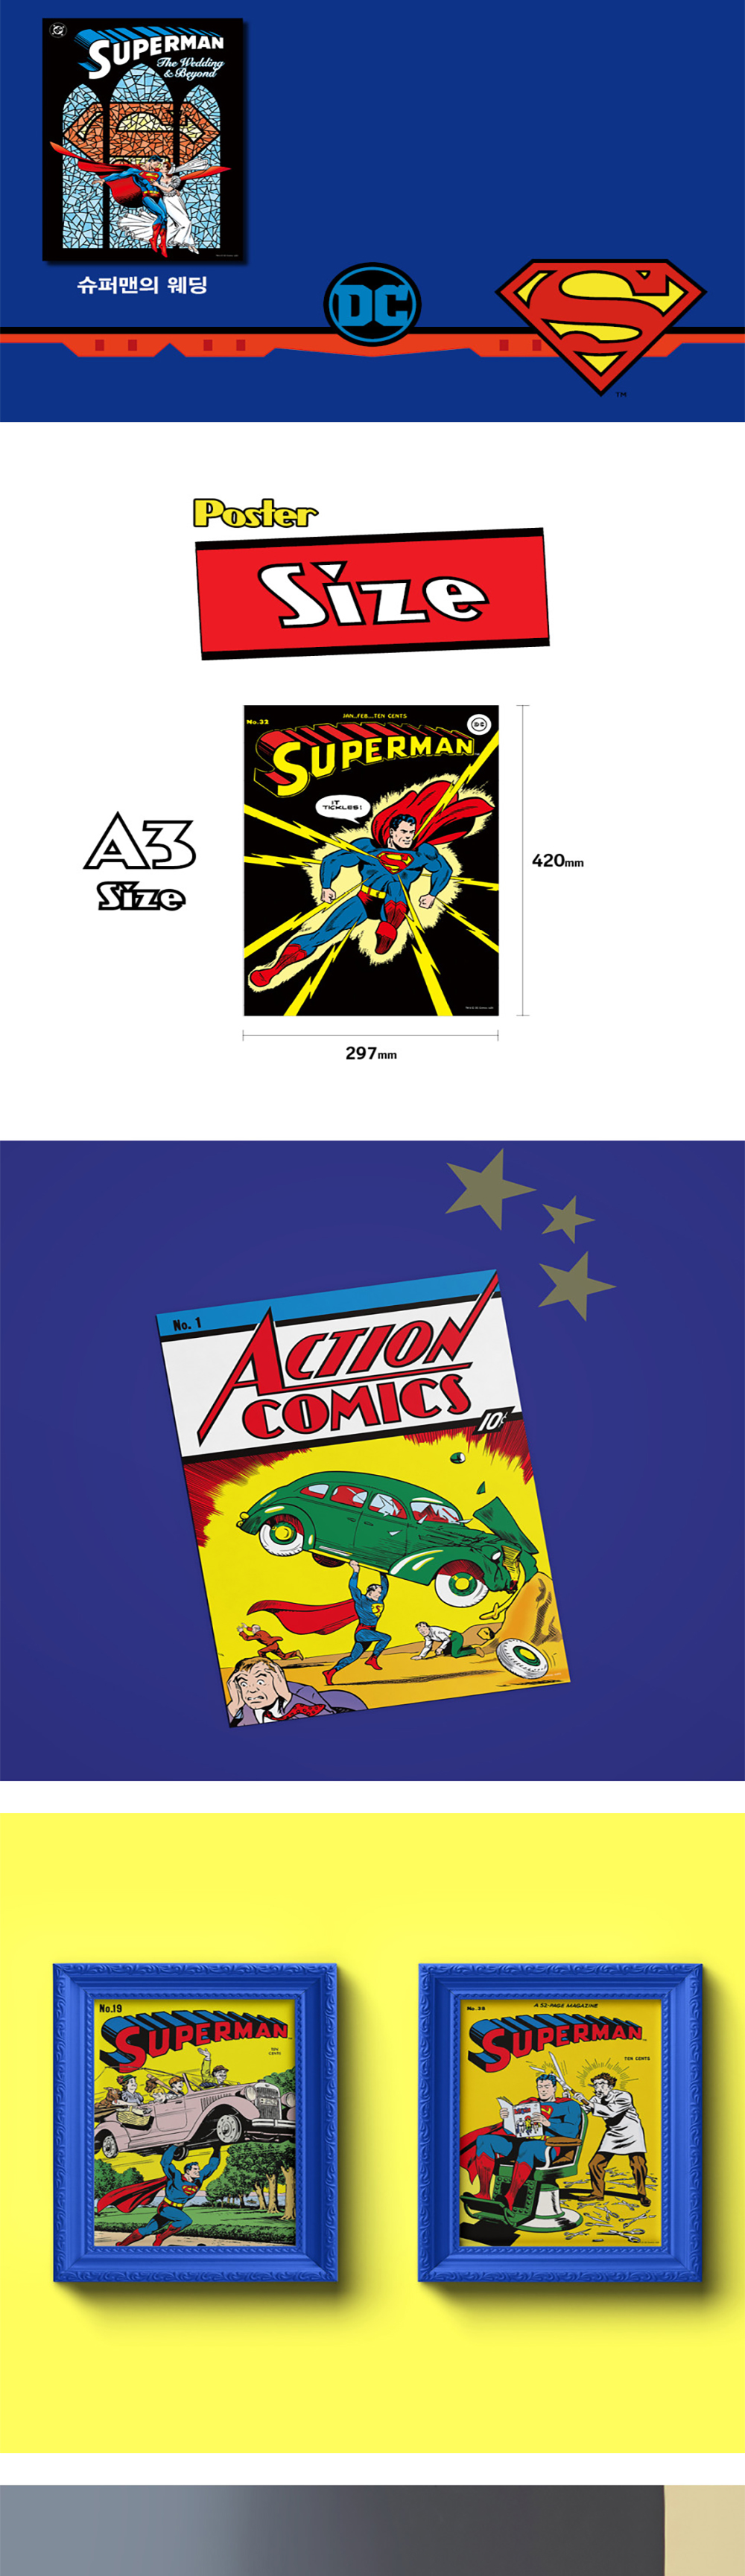 DC코믹스 인테리어 포스터_슈퍼맨_03.jpg